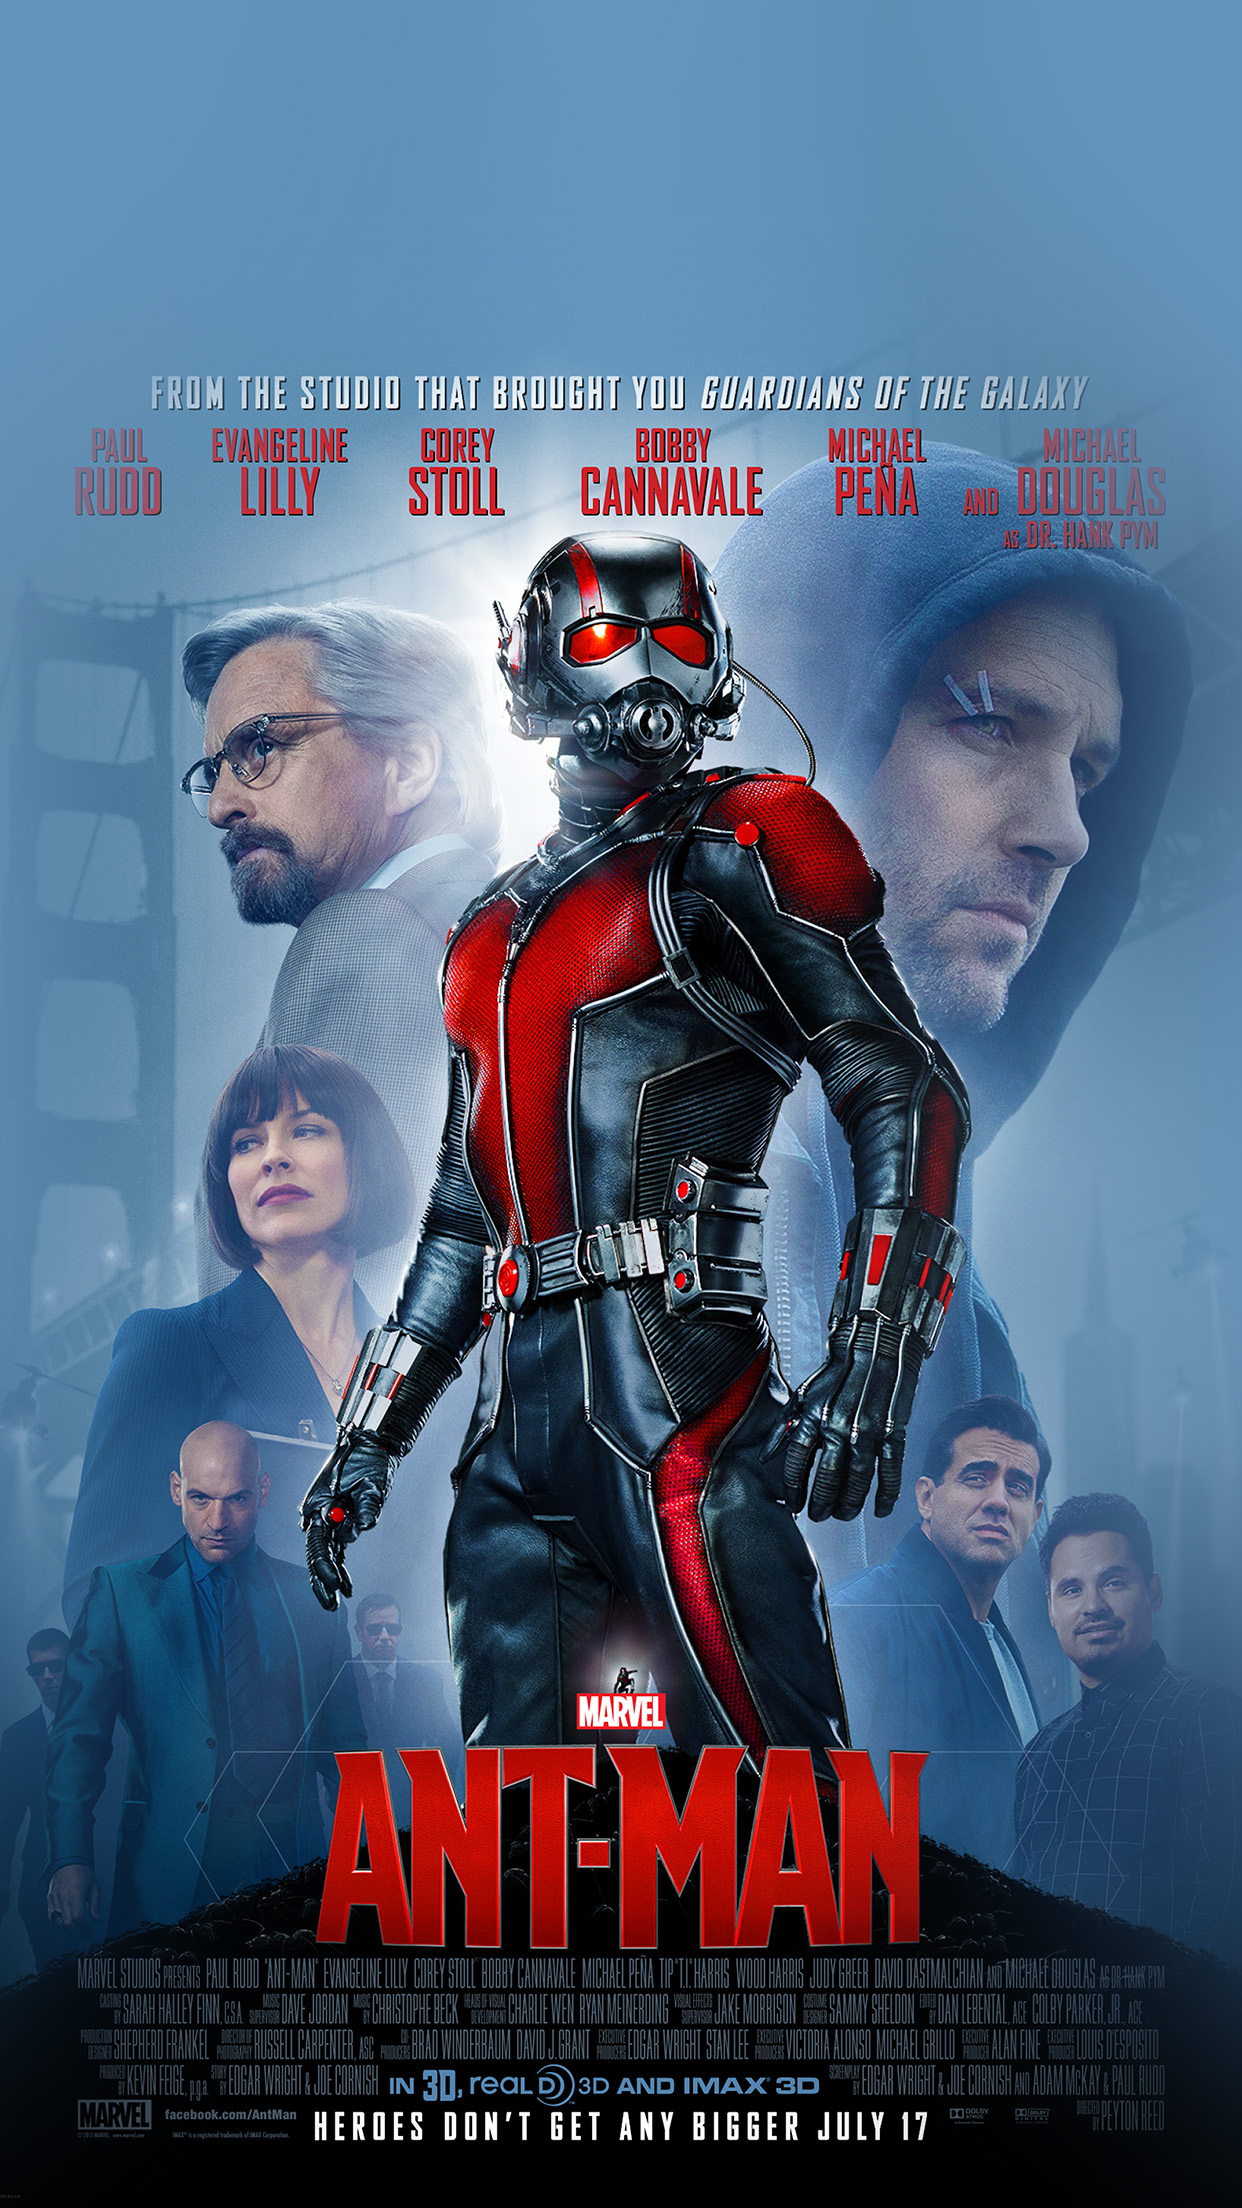 Al91 marvel antman poster hero art illust film Papersco